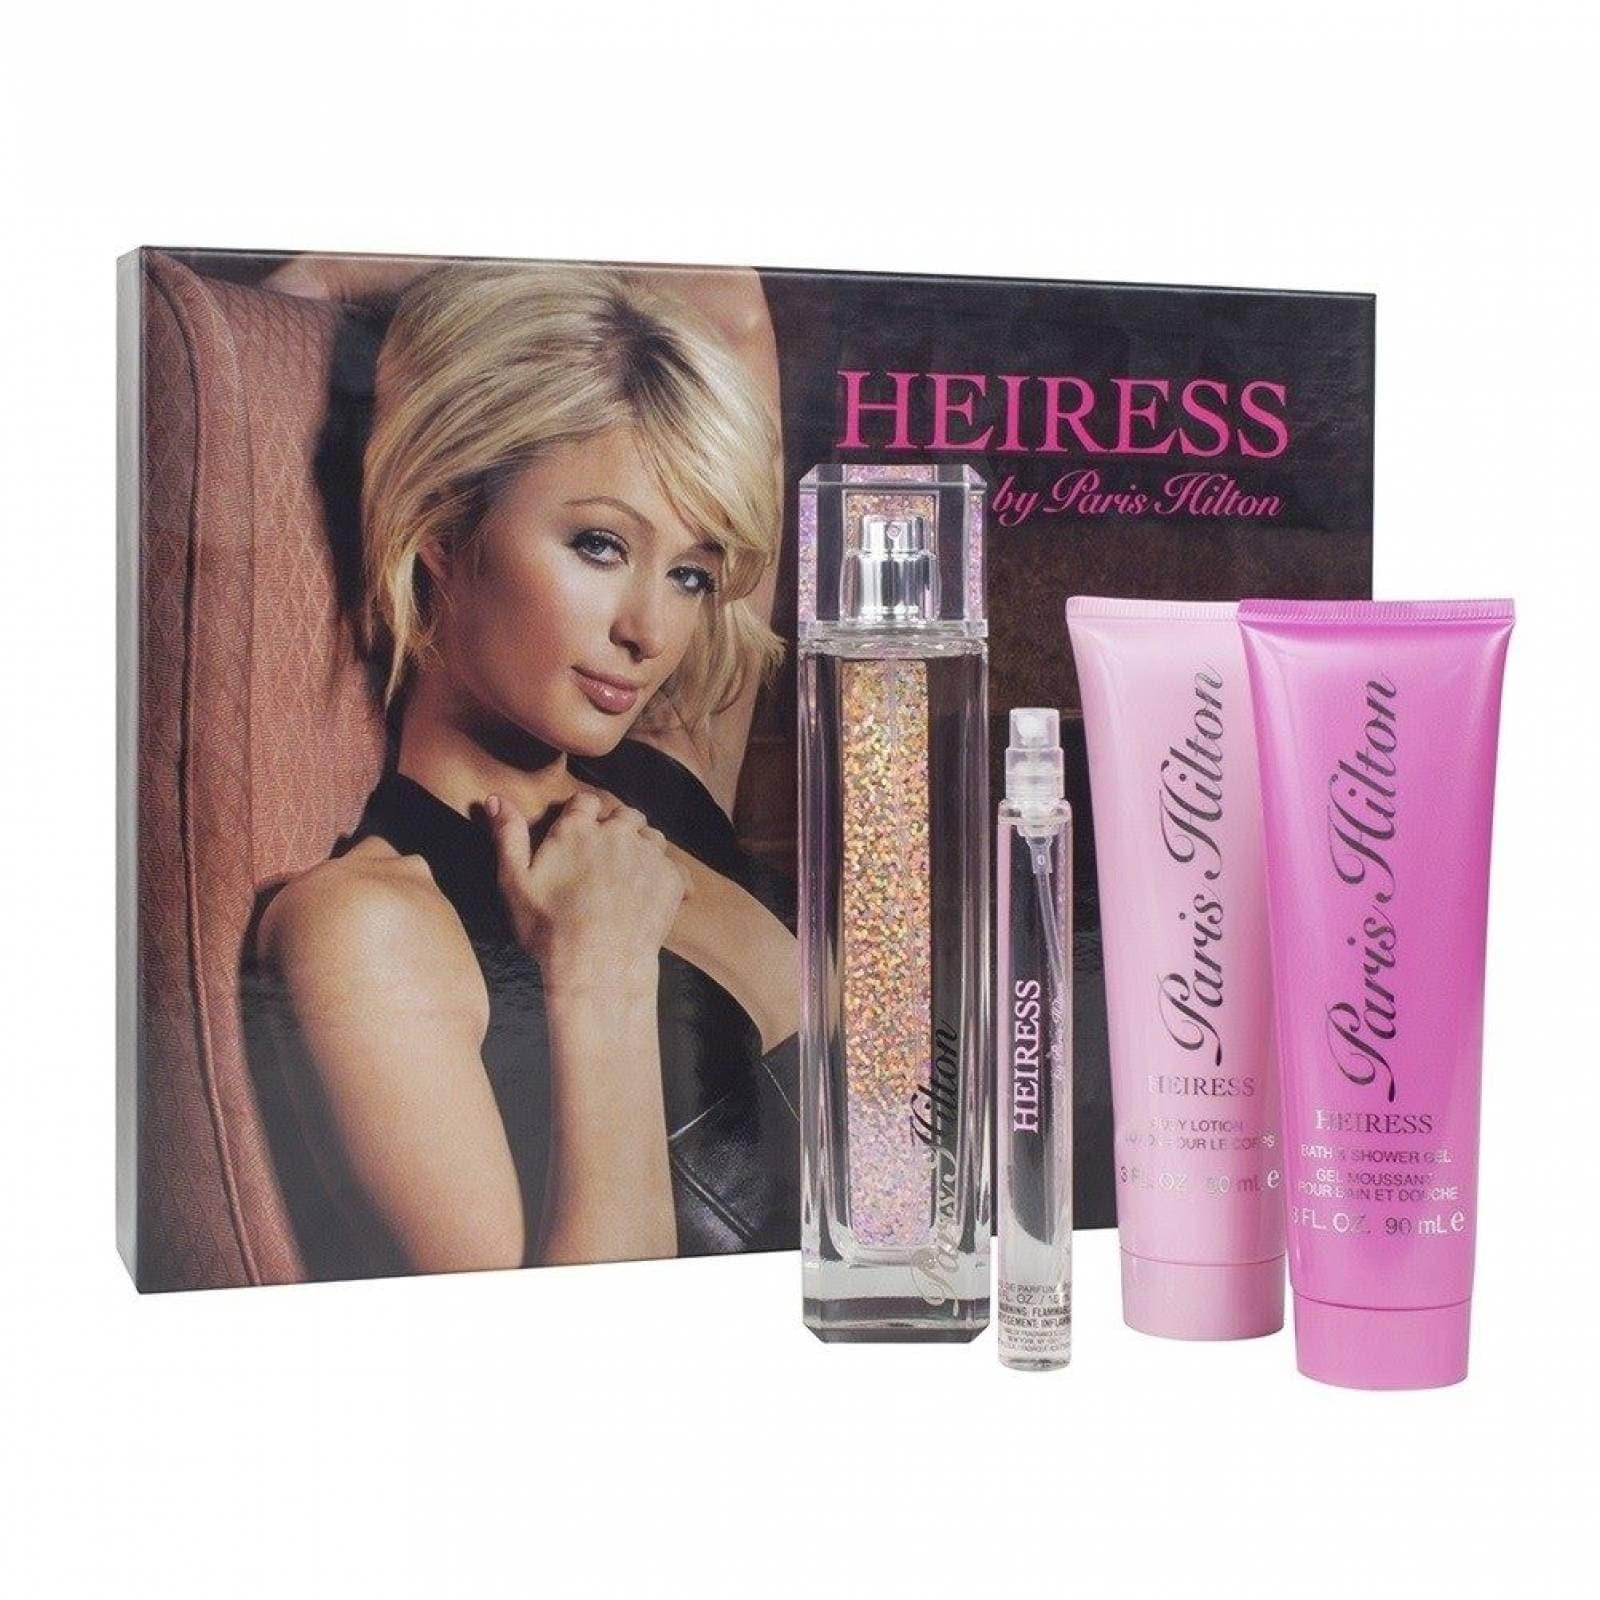 Set Heiress Paris Hilton Dama 4 Pz